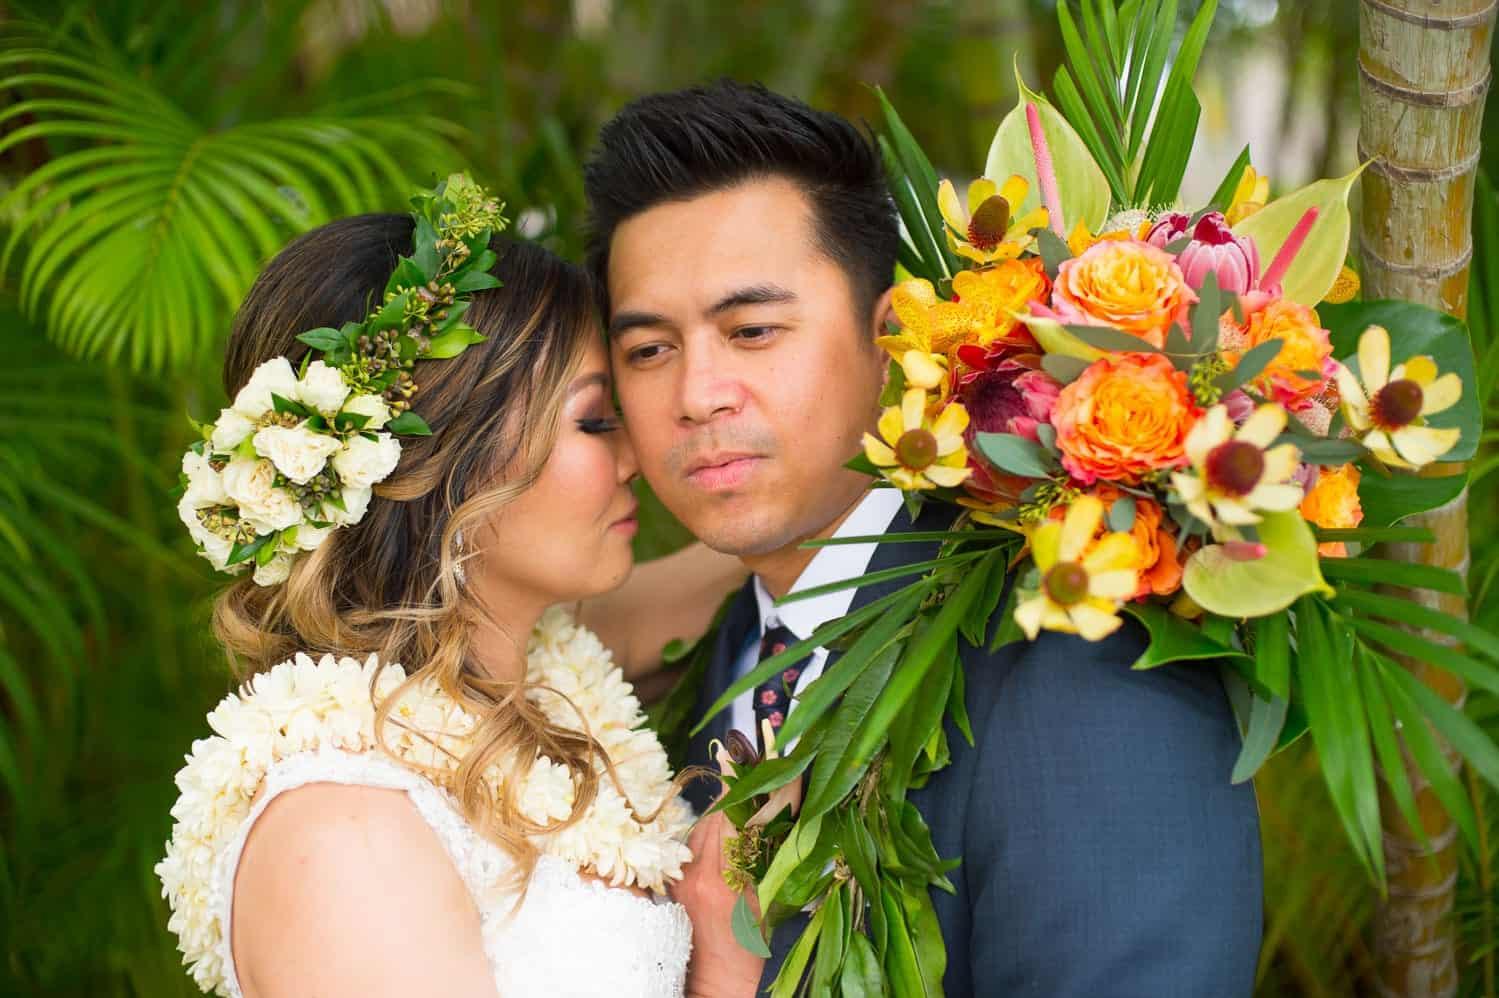 Flowers with Love on Maui 2018 (Popular wedding flowers)